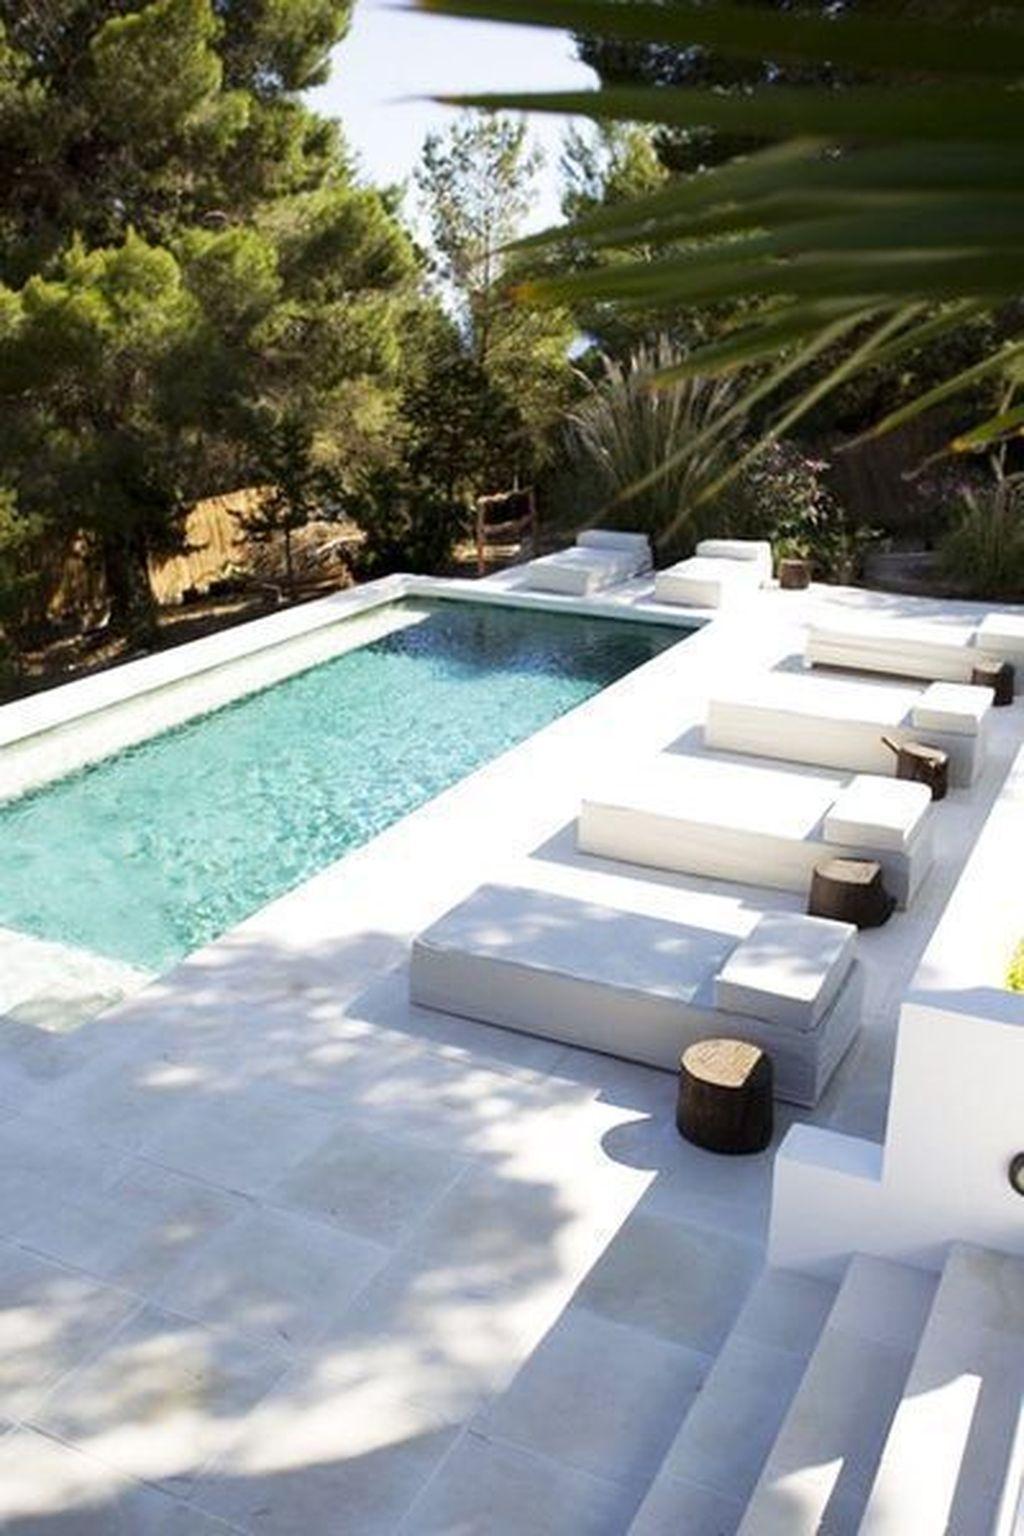 Admirable Small Swimming Pool Designs Ideas 07